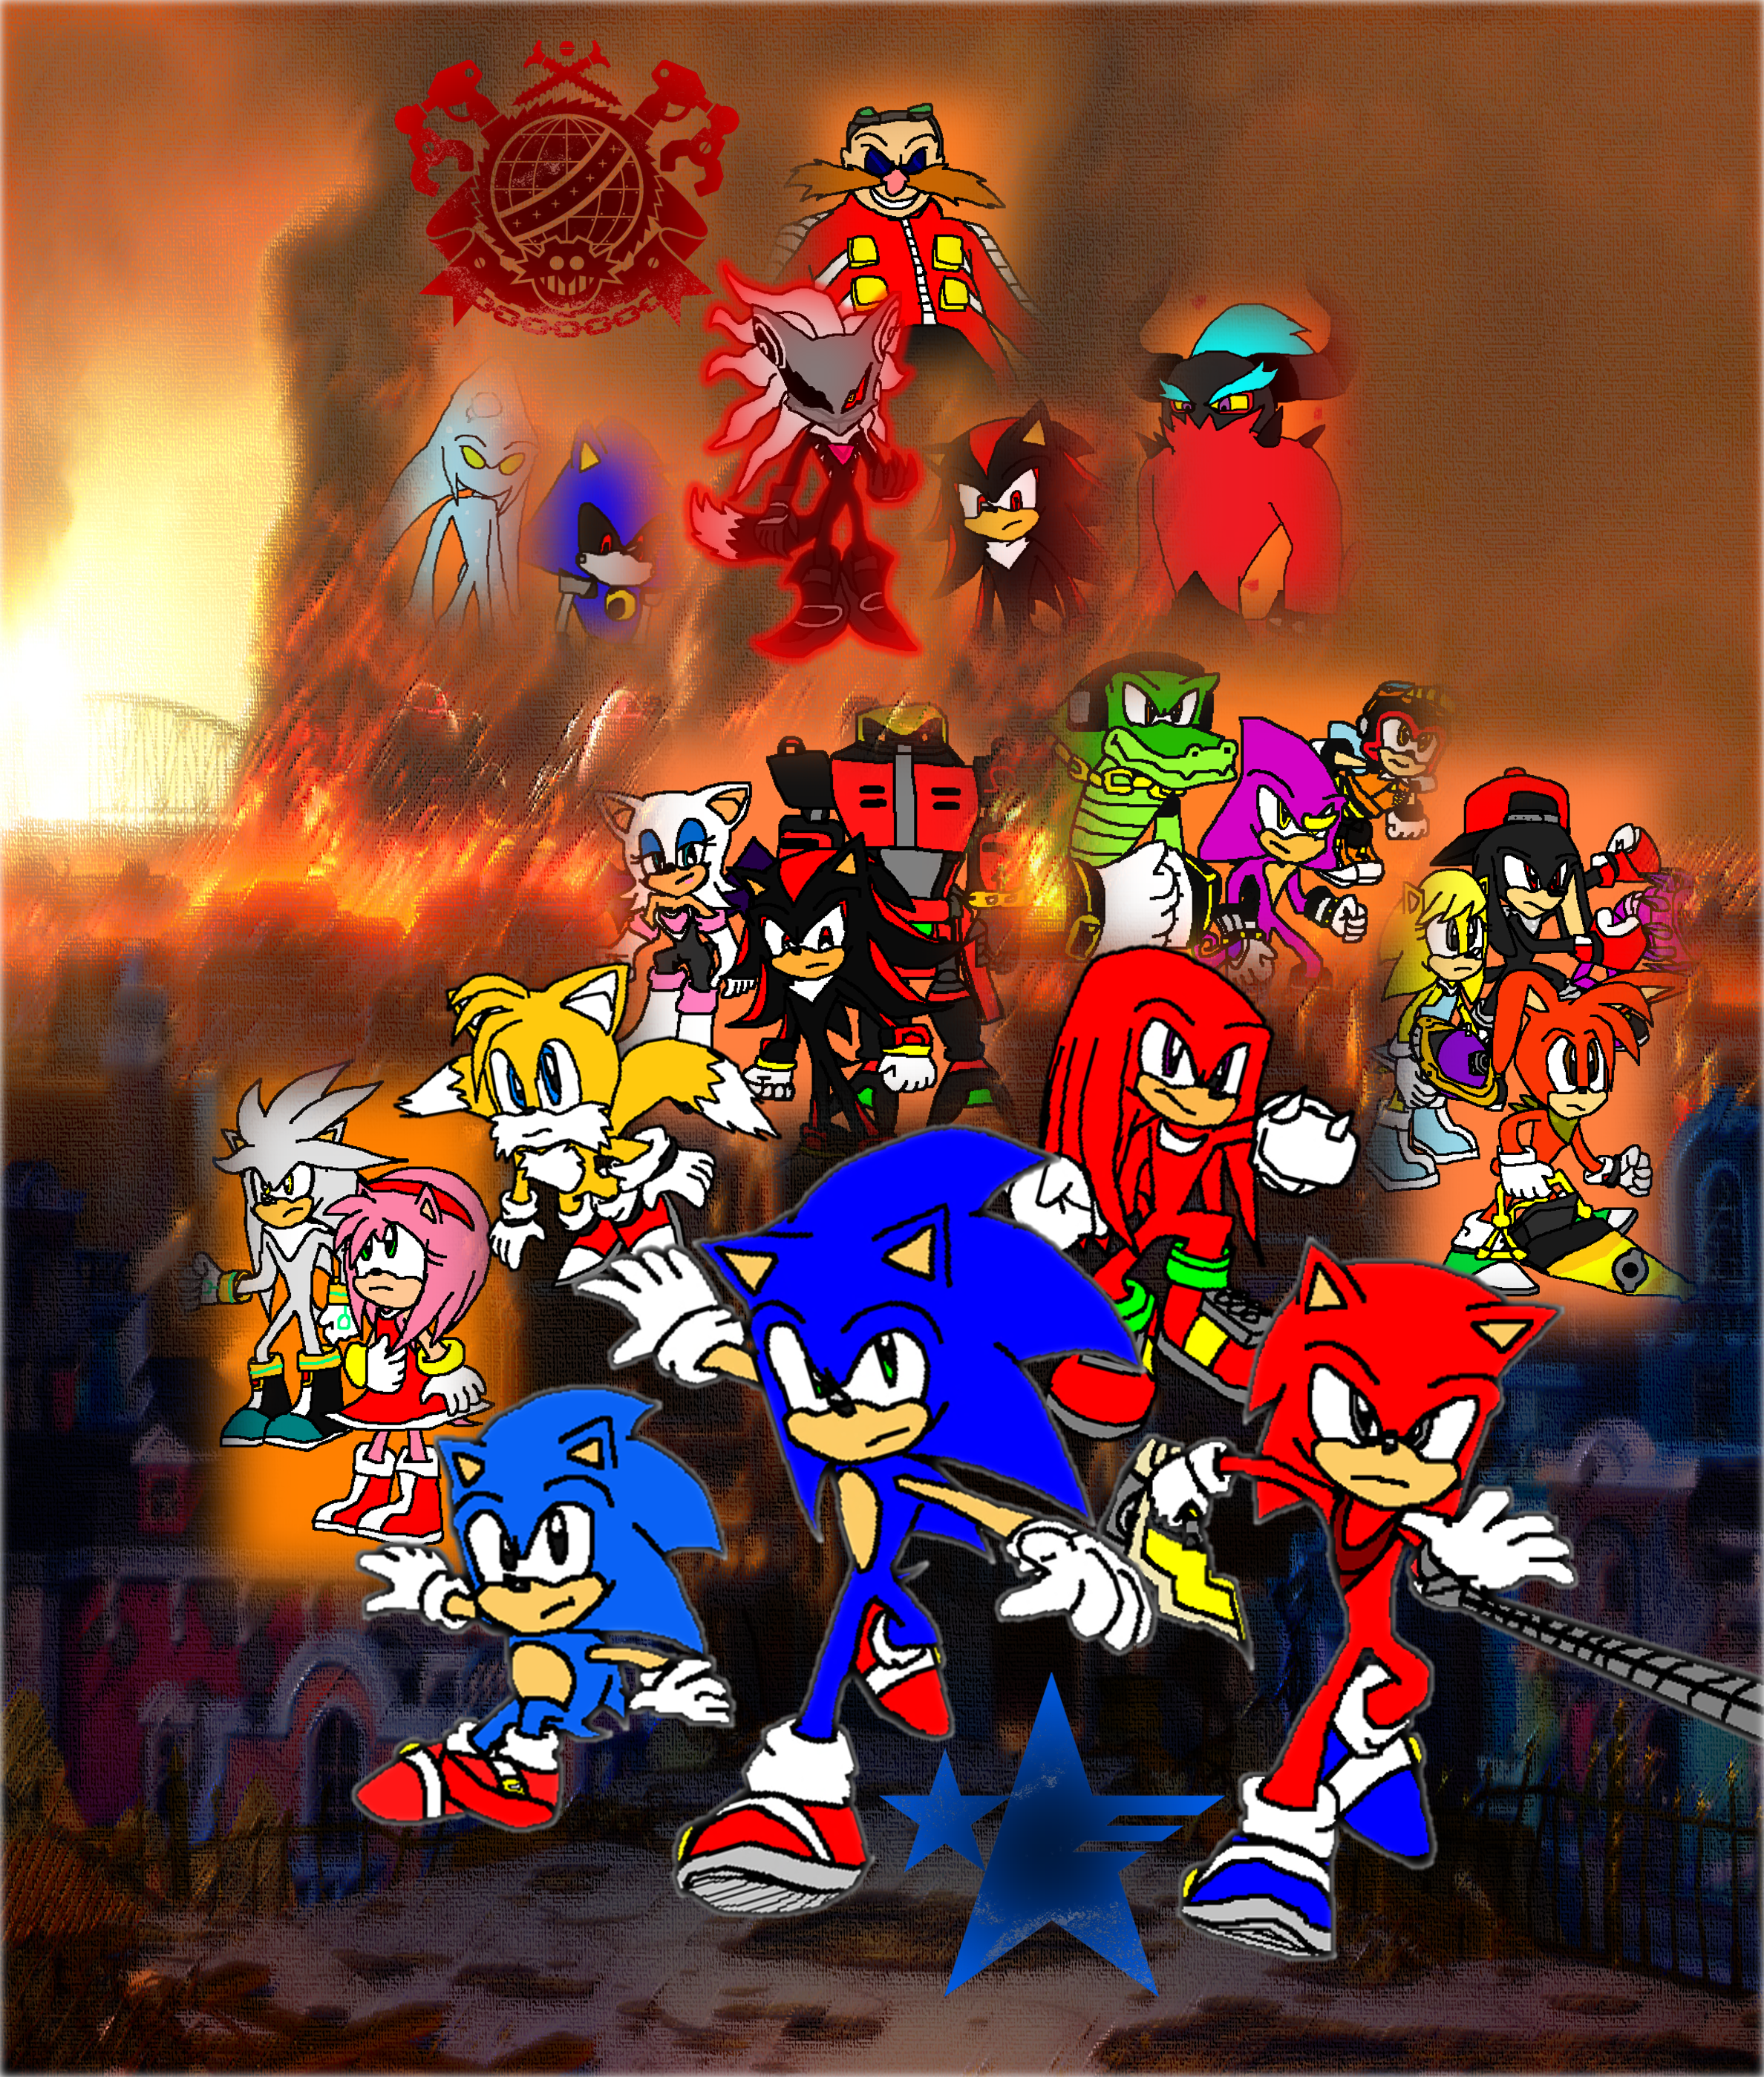 Sonic Forces Resistance Uprising Vs Eggman Empire By 9029561 On Deviantart